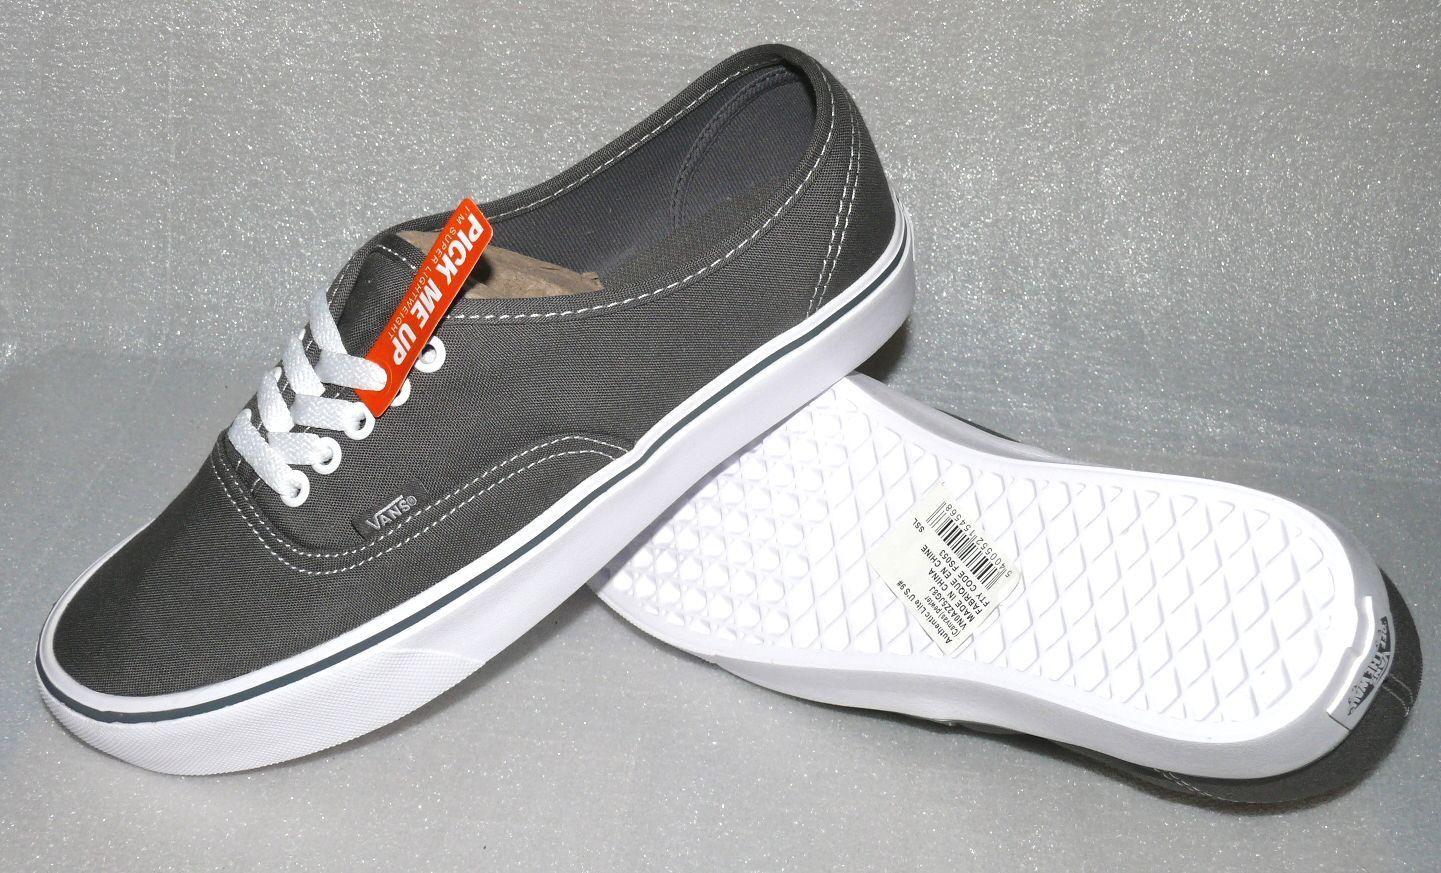 Vans Authentic Authentic Authentic Lite Canvas Herren Schuhe Stiefel EU 42 US9 Freizeit Skater Dk.Grau fba49b